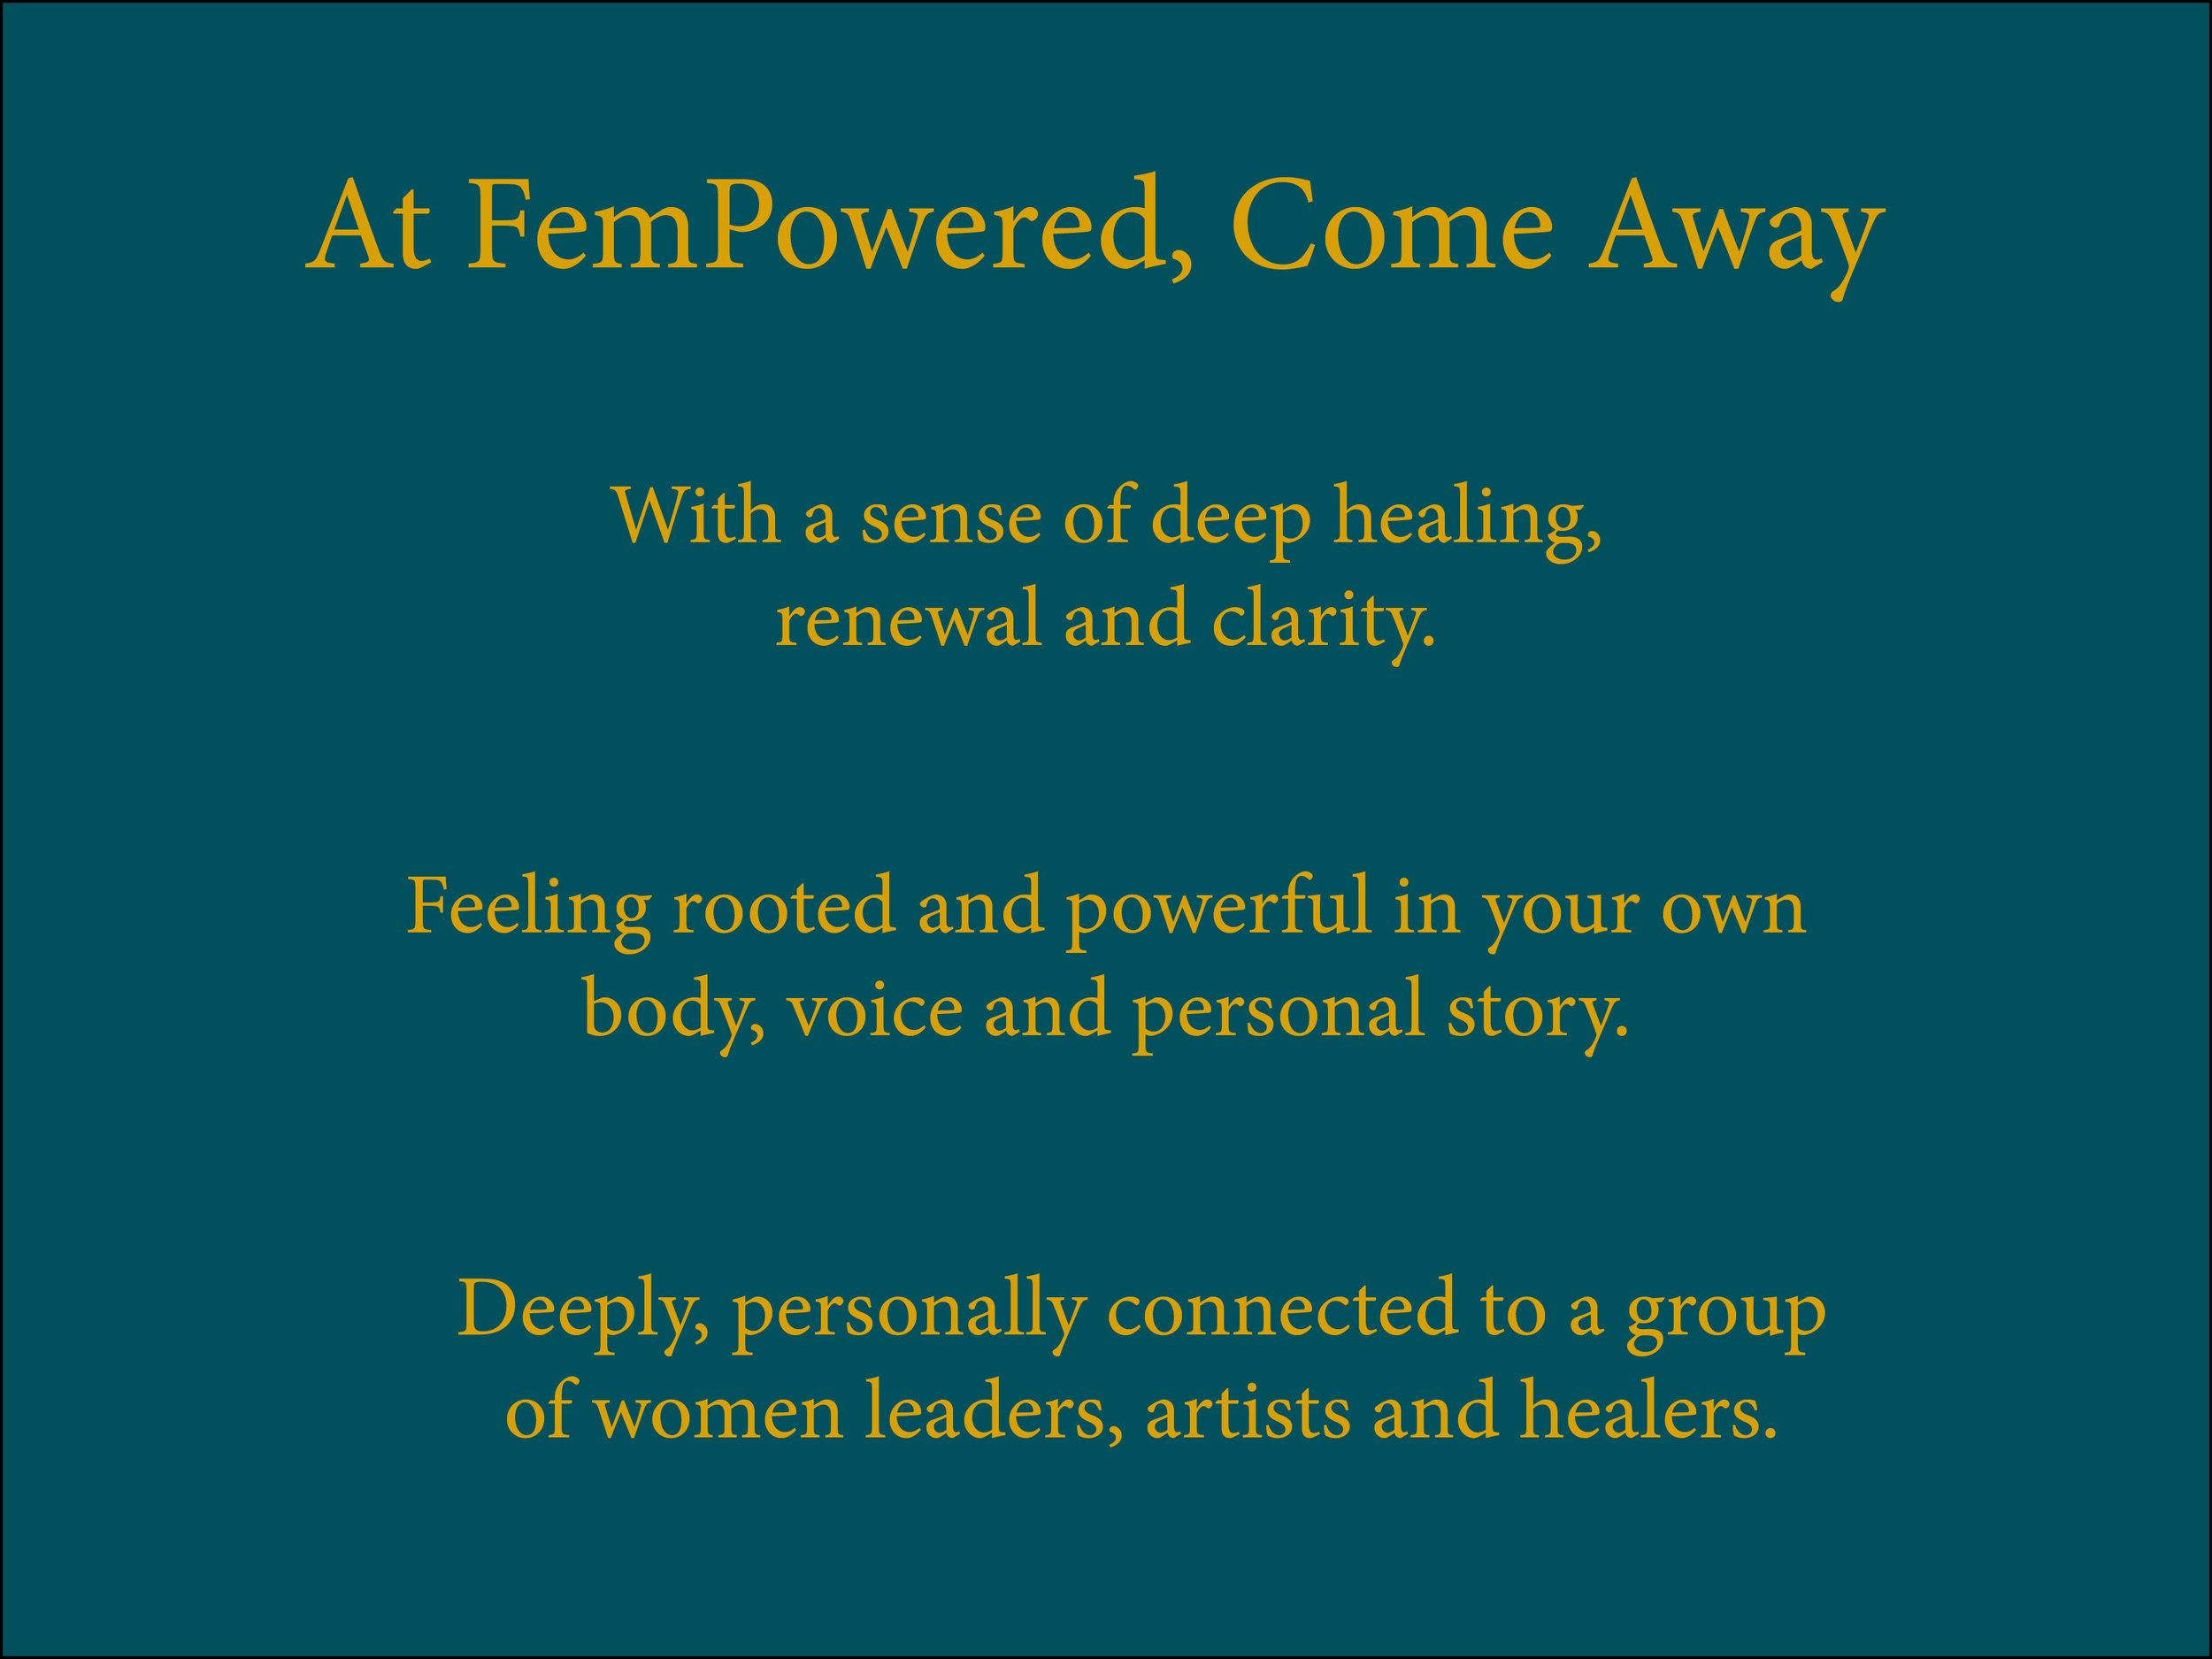 FemPowered-Leadership-Retreat-For-Women-Results.jpg